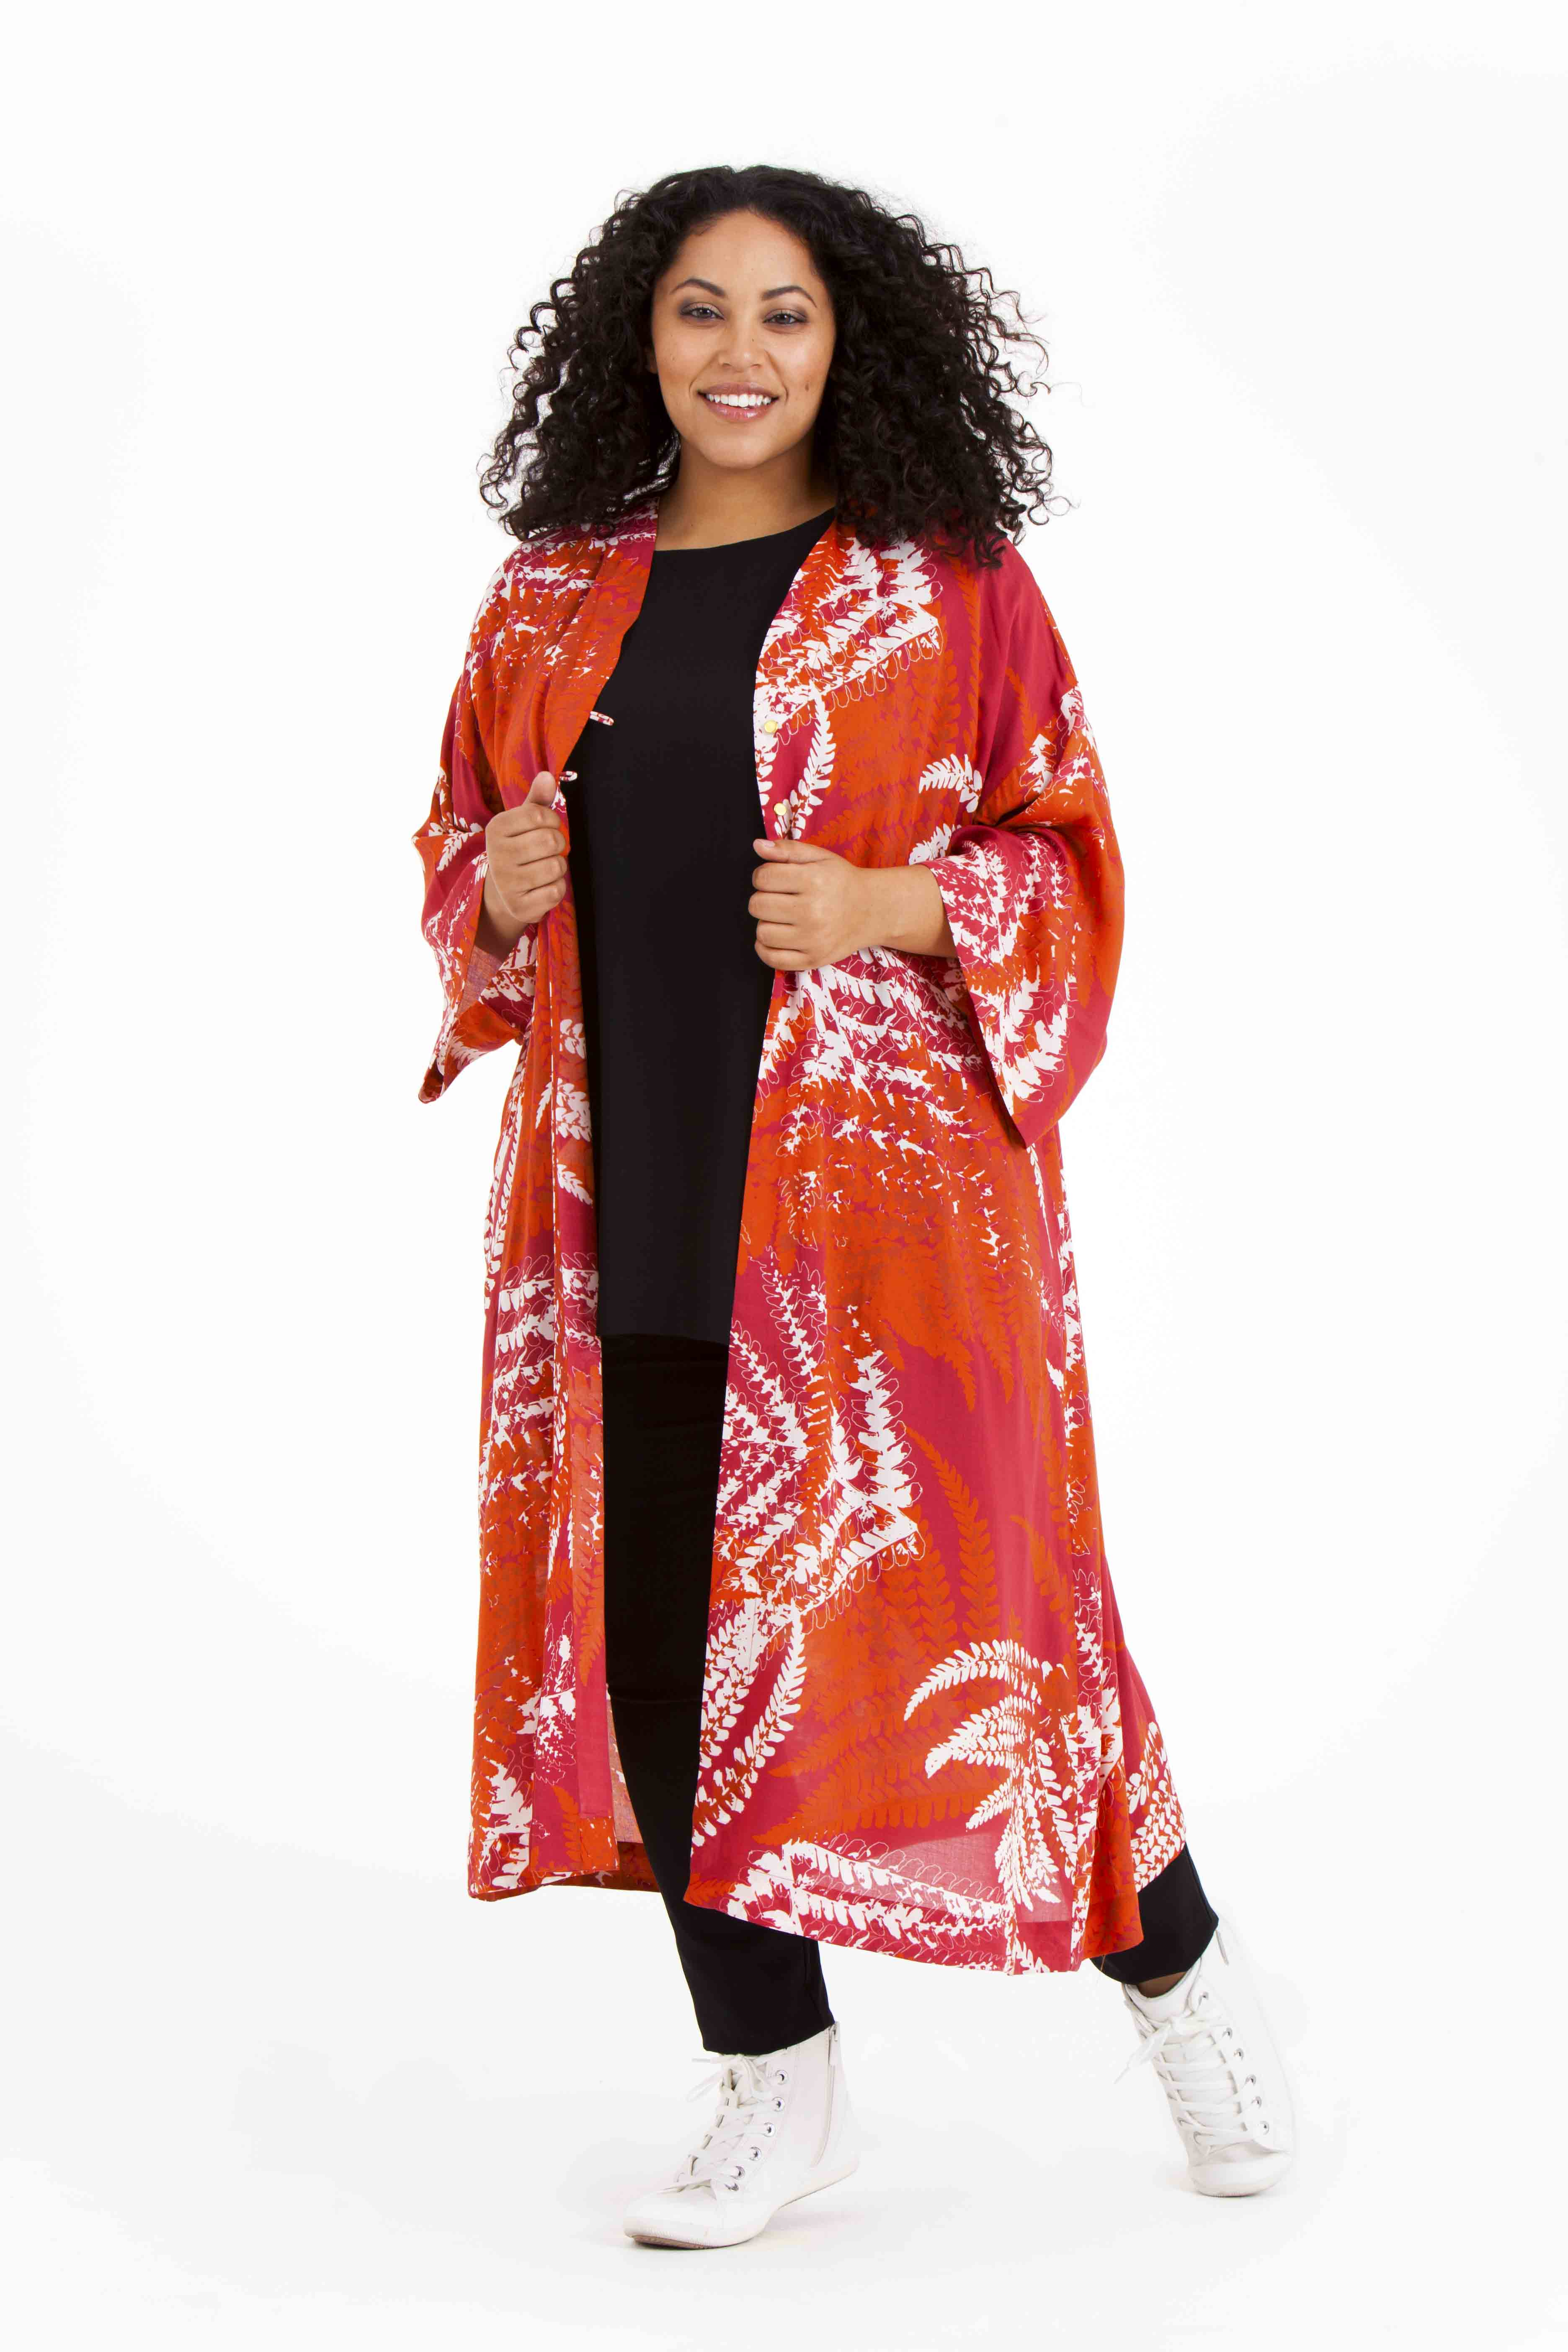 Årets modell Audrey på språng i Oksana kimono Pris 799:- Olina topp 499:- Pamela byxa 699:-